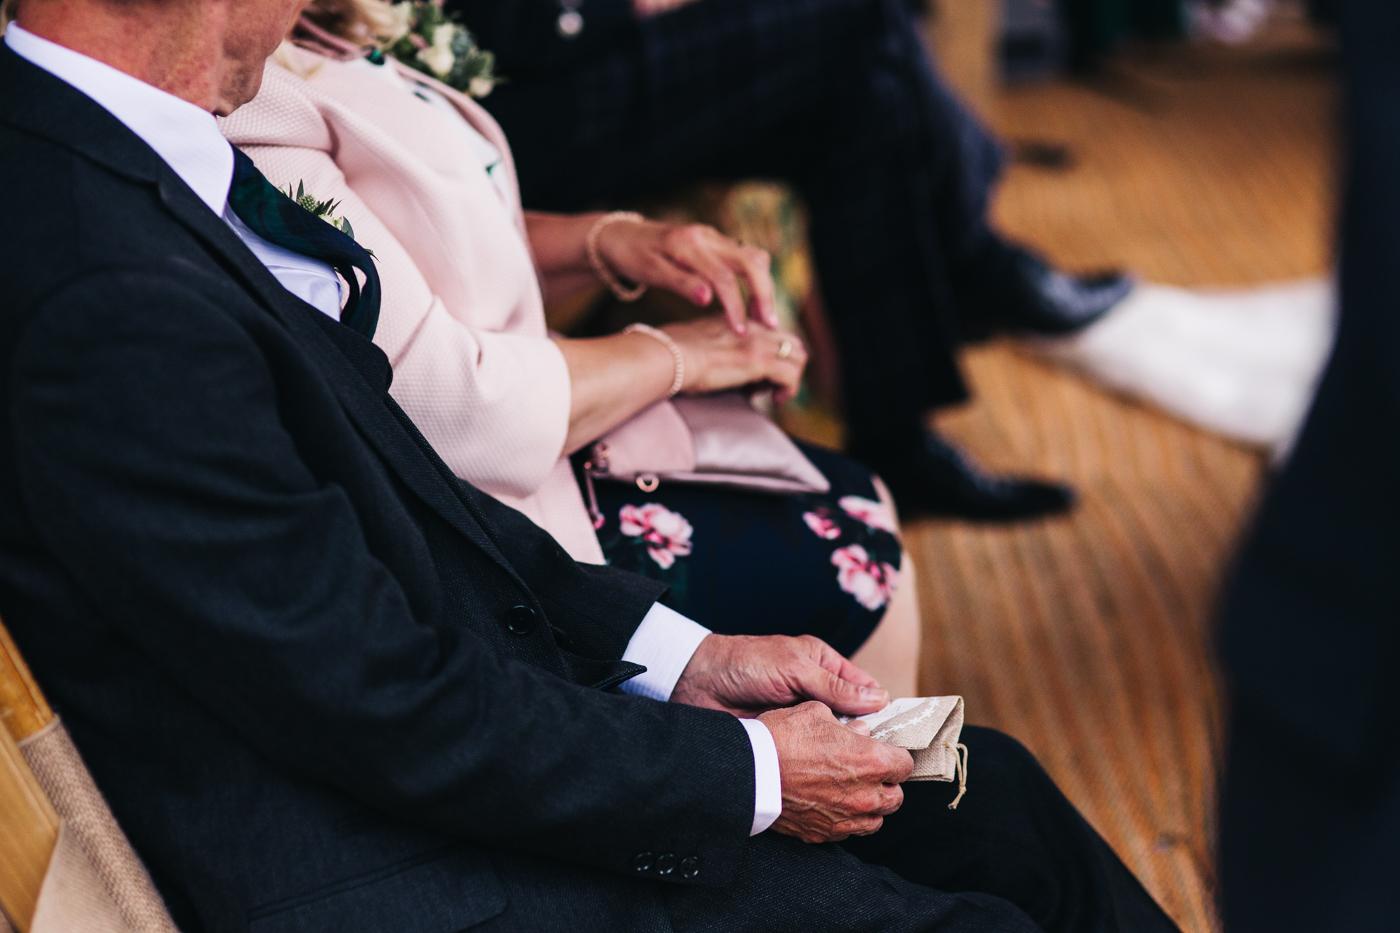 scottish-wedding-trossachs-loch-tay-highlannds-relaxed-photography-photographer-0020.jpg